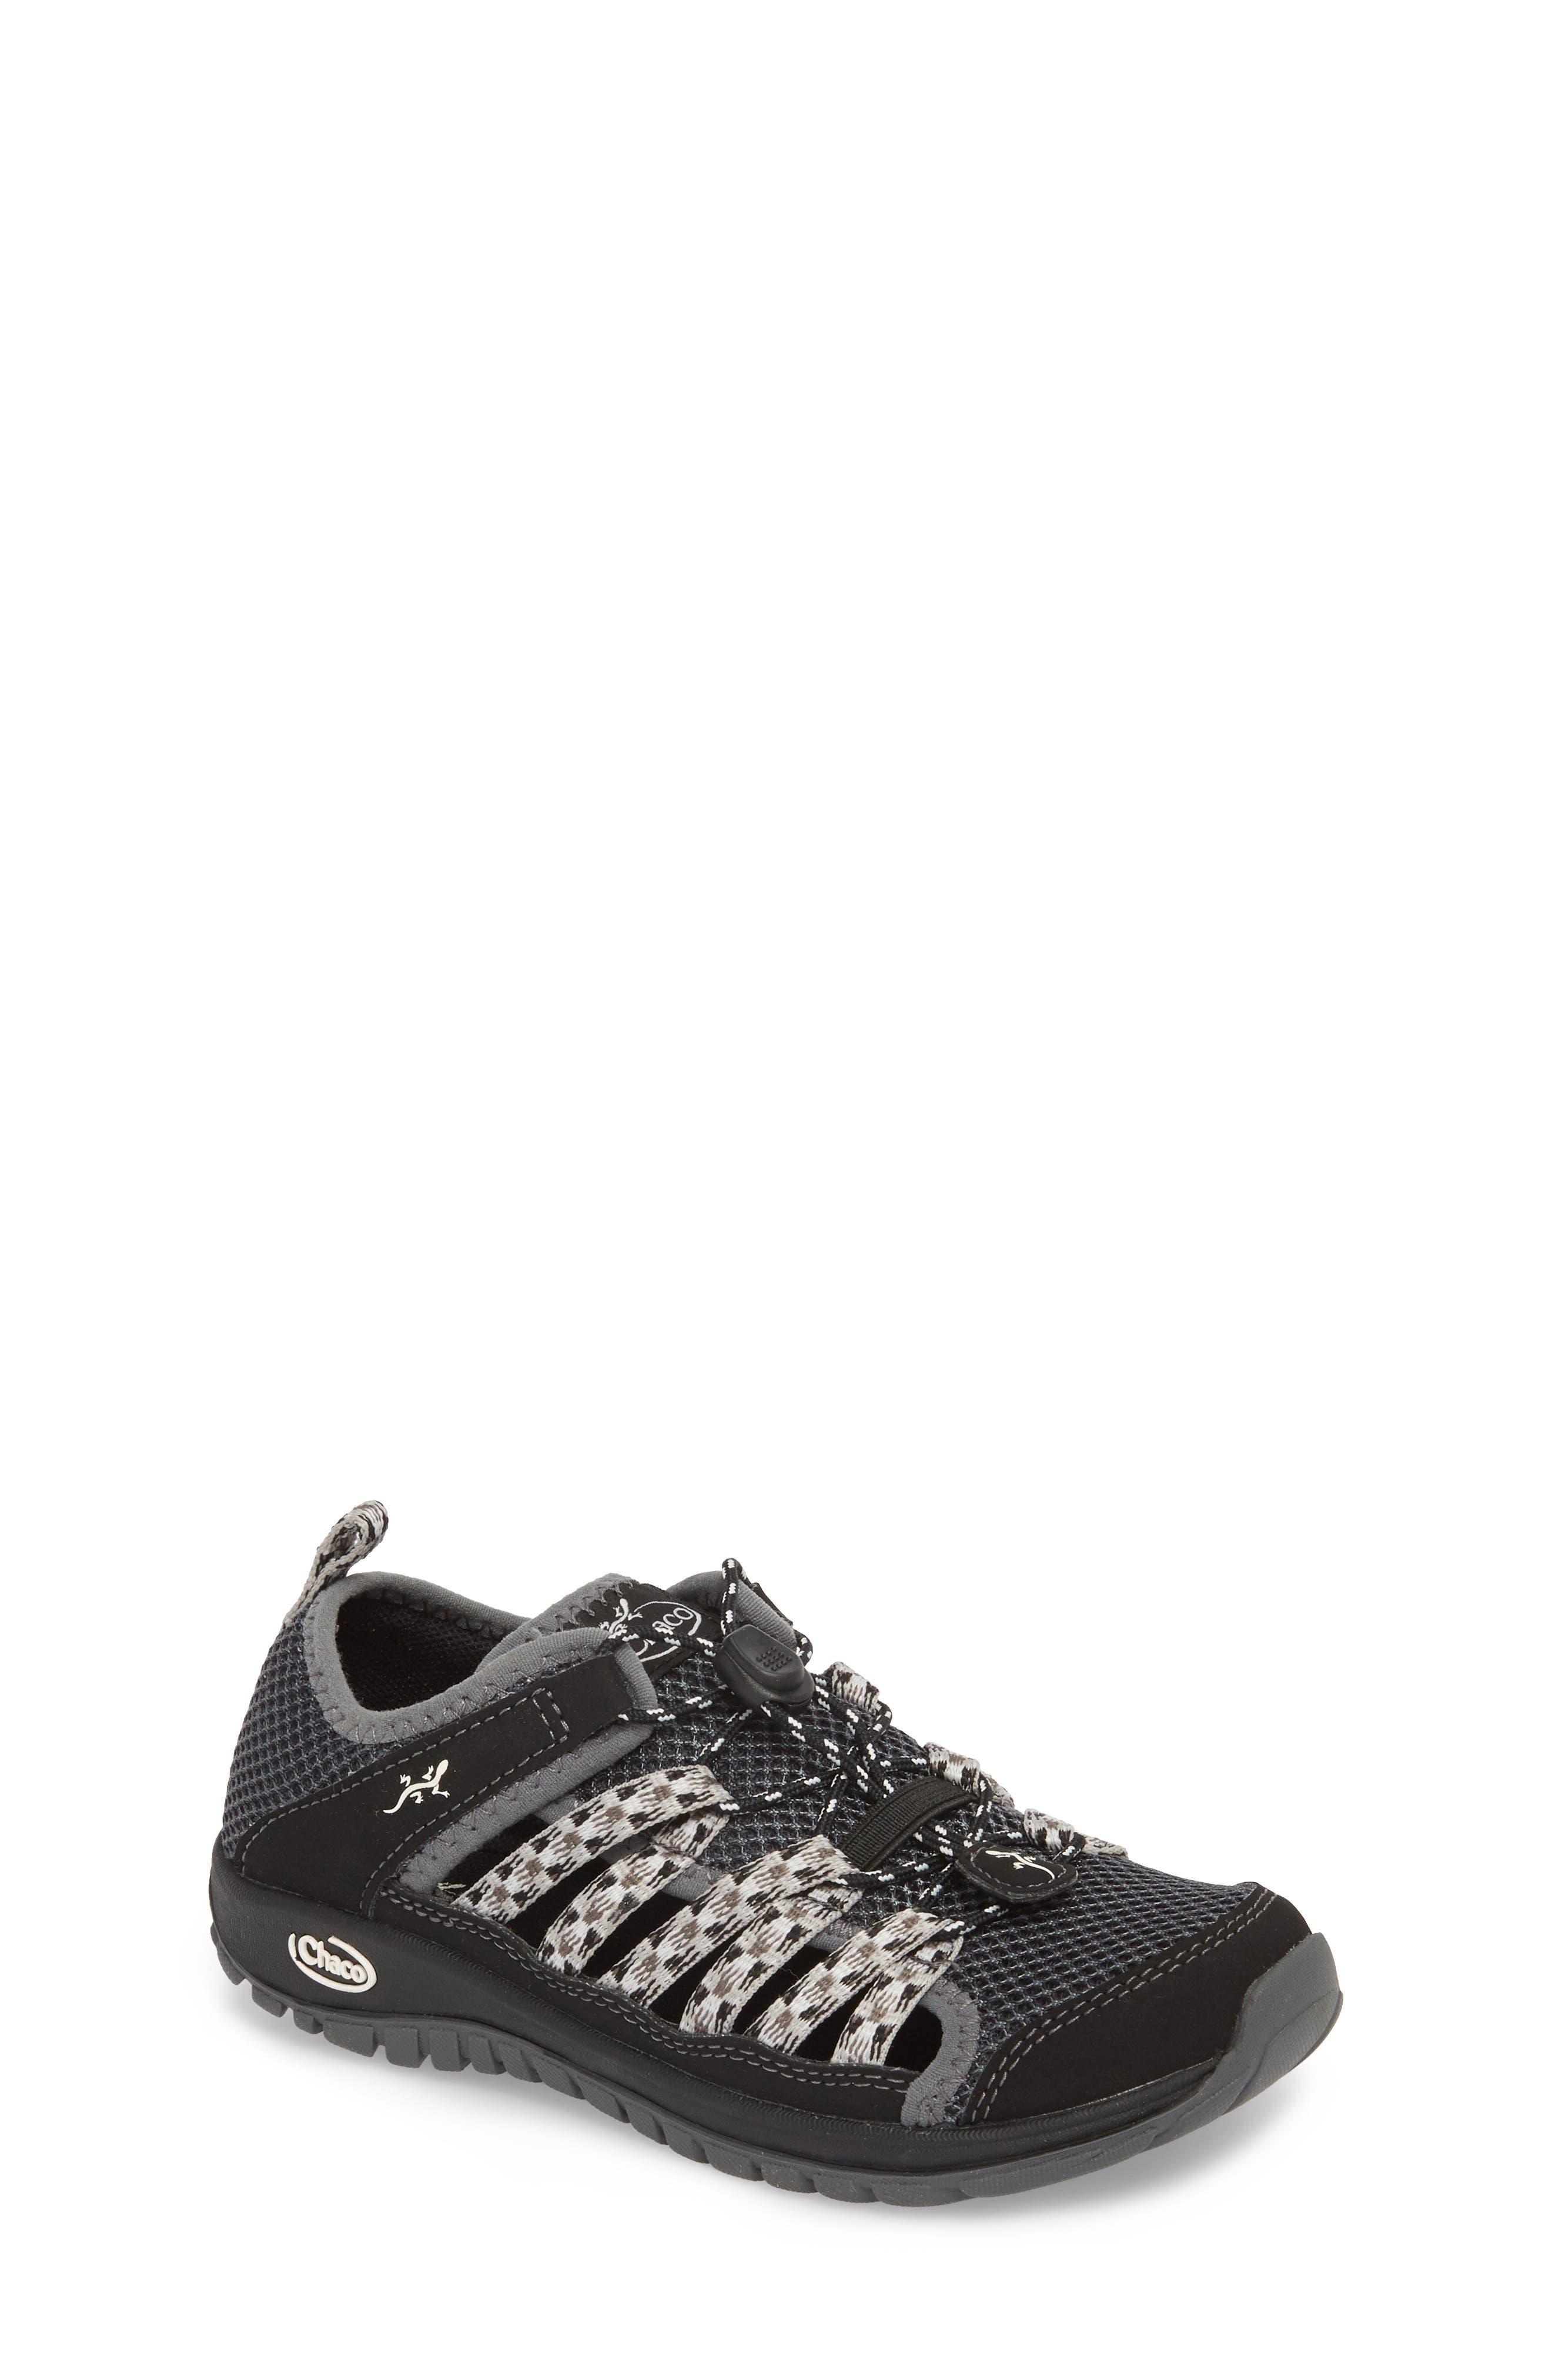 Outcross 2 Water Sneaker,                         Main,                         color, BLACK